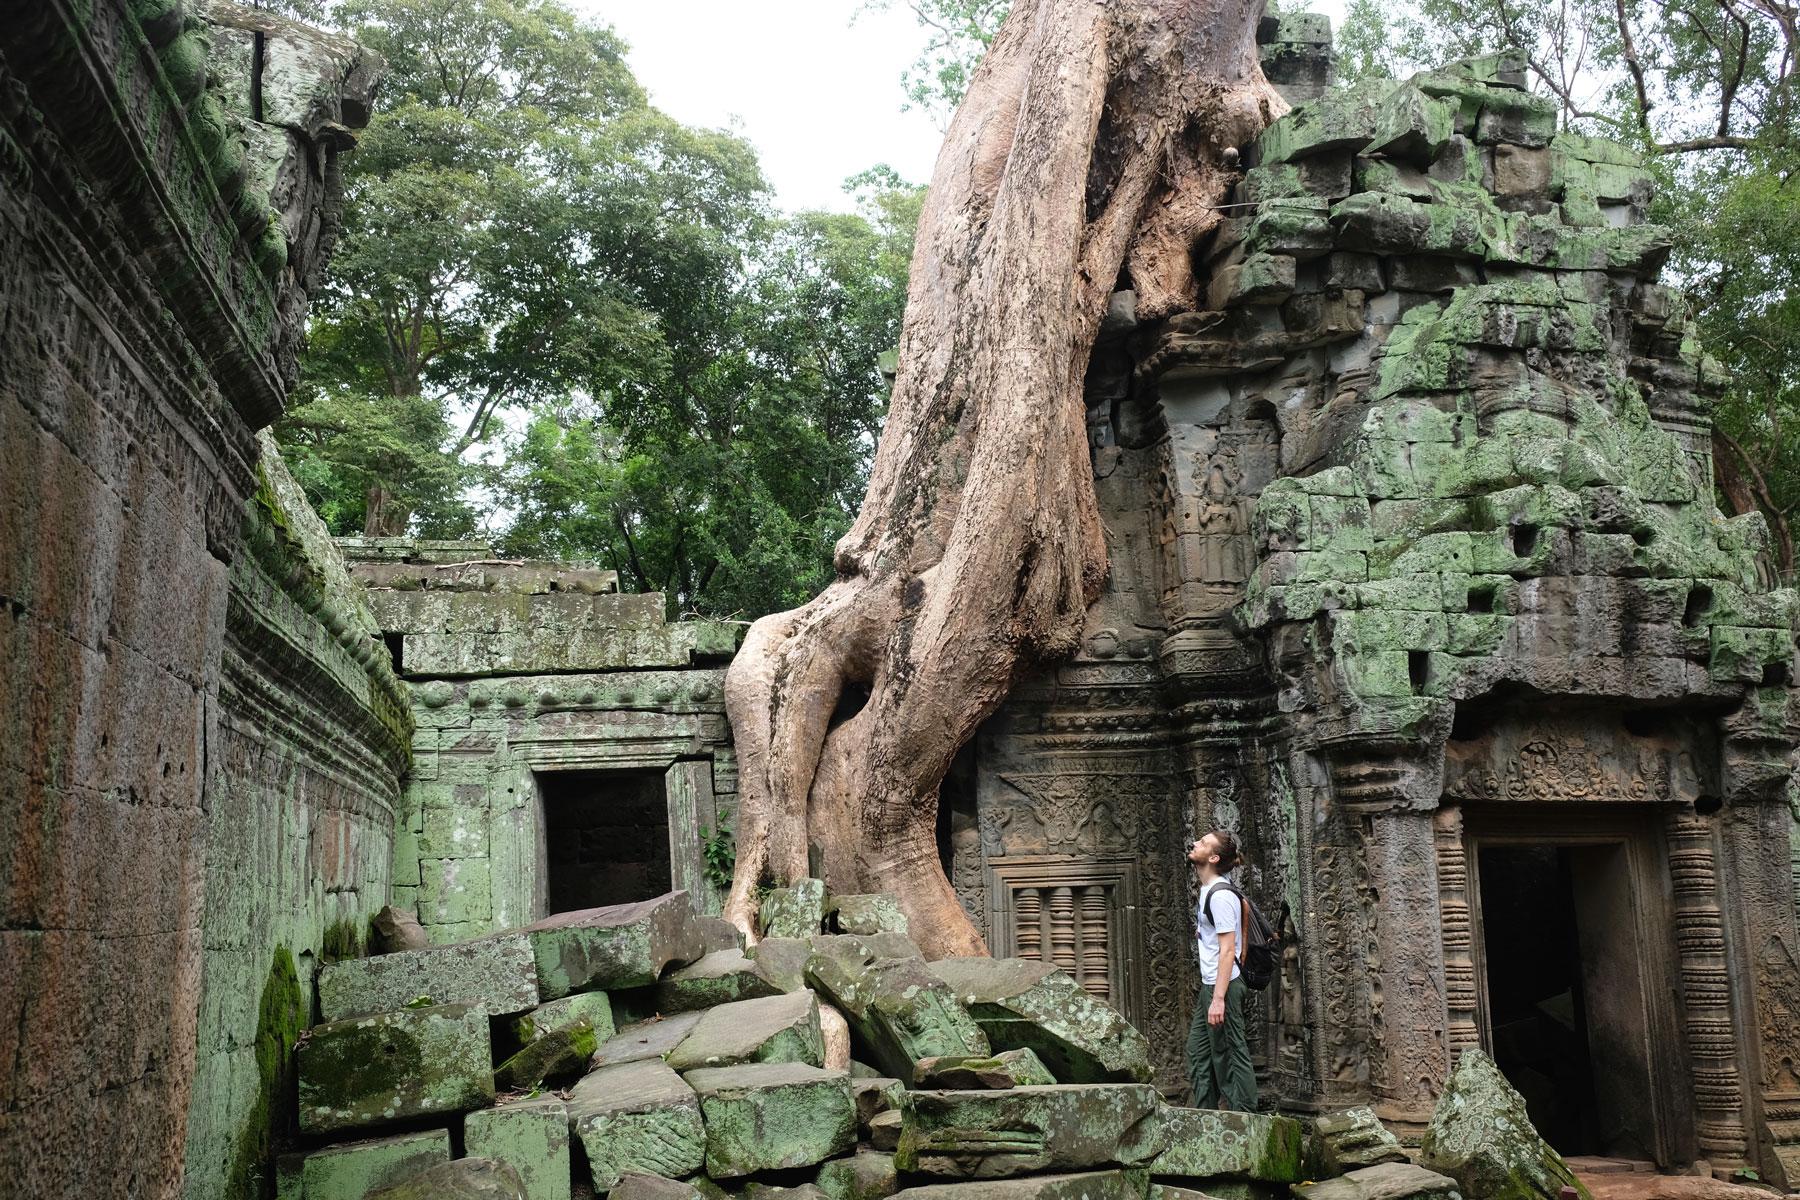 Sebastian steht vor den riesigen Wurzeln im Ta Prohm Tempel in Angkor Wat